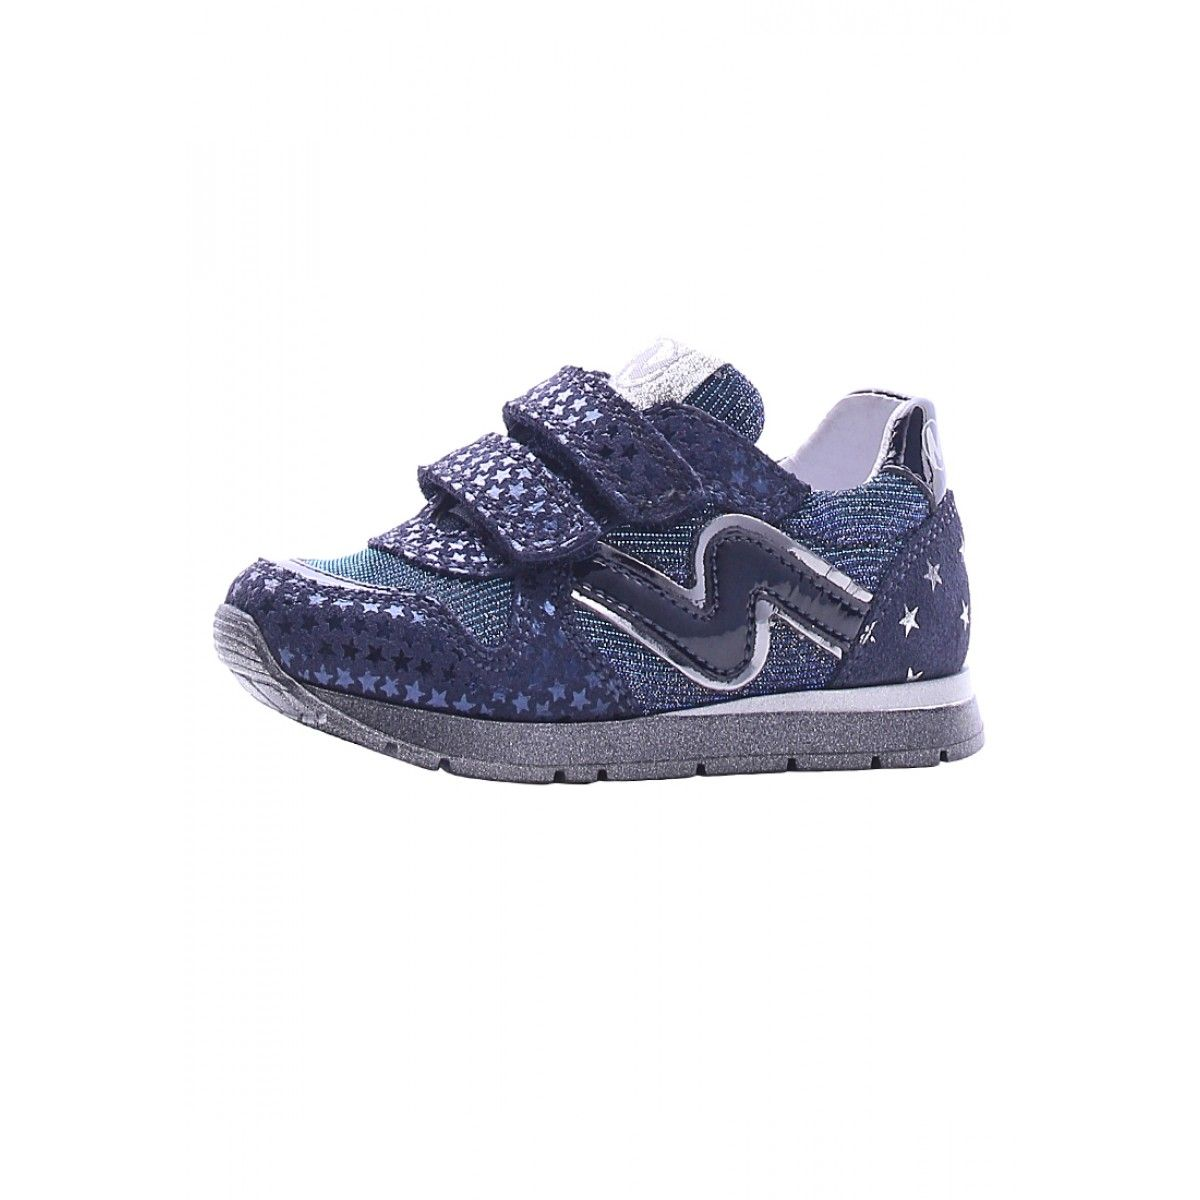 NATURINO BOMBA VL - Sneakers – Blue - Sneakers - Girl